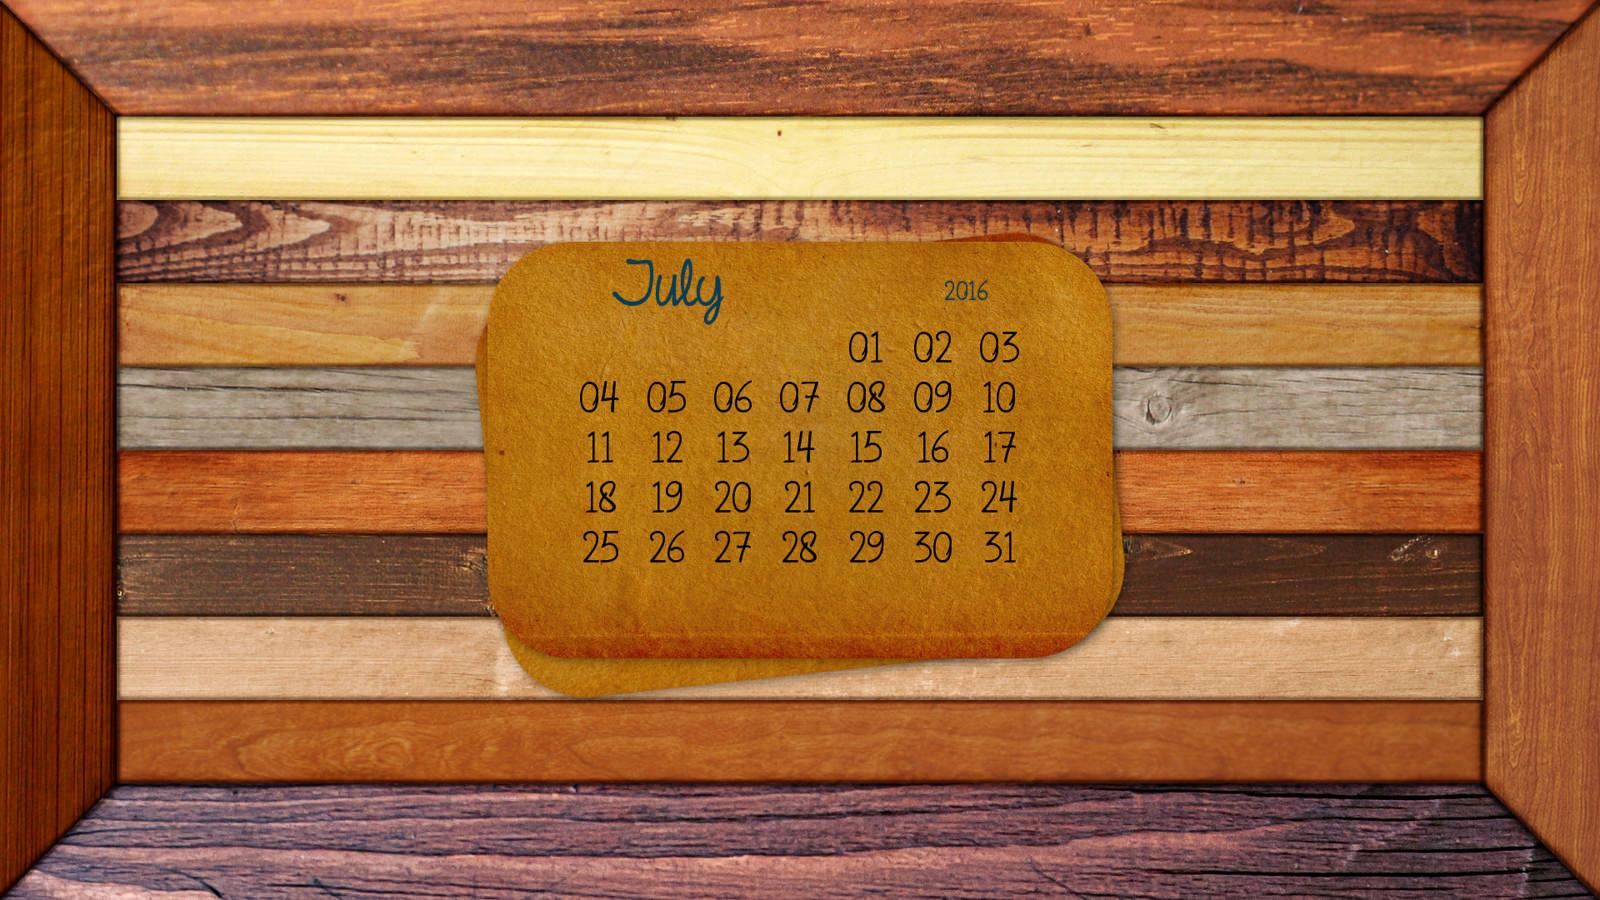 https-flic-kr-p-JzW-July-DeskCal-July-Desktop-Calendar-Using-the-clone-tool-dif-wallpaper-wp3806773